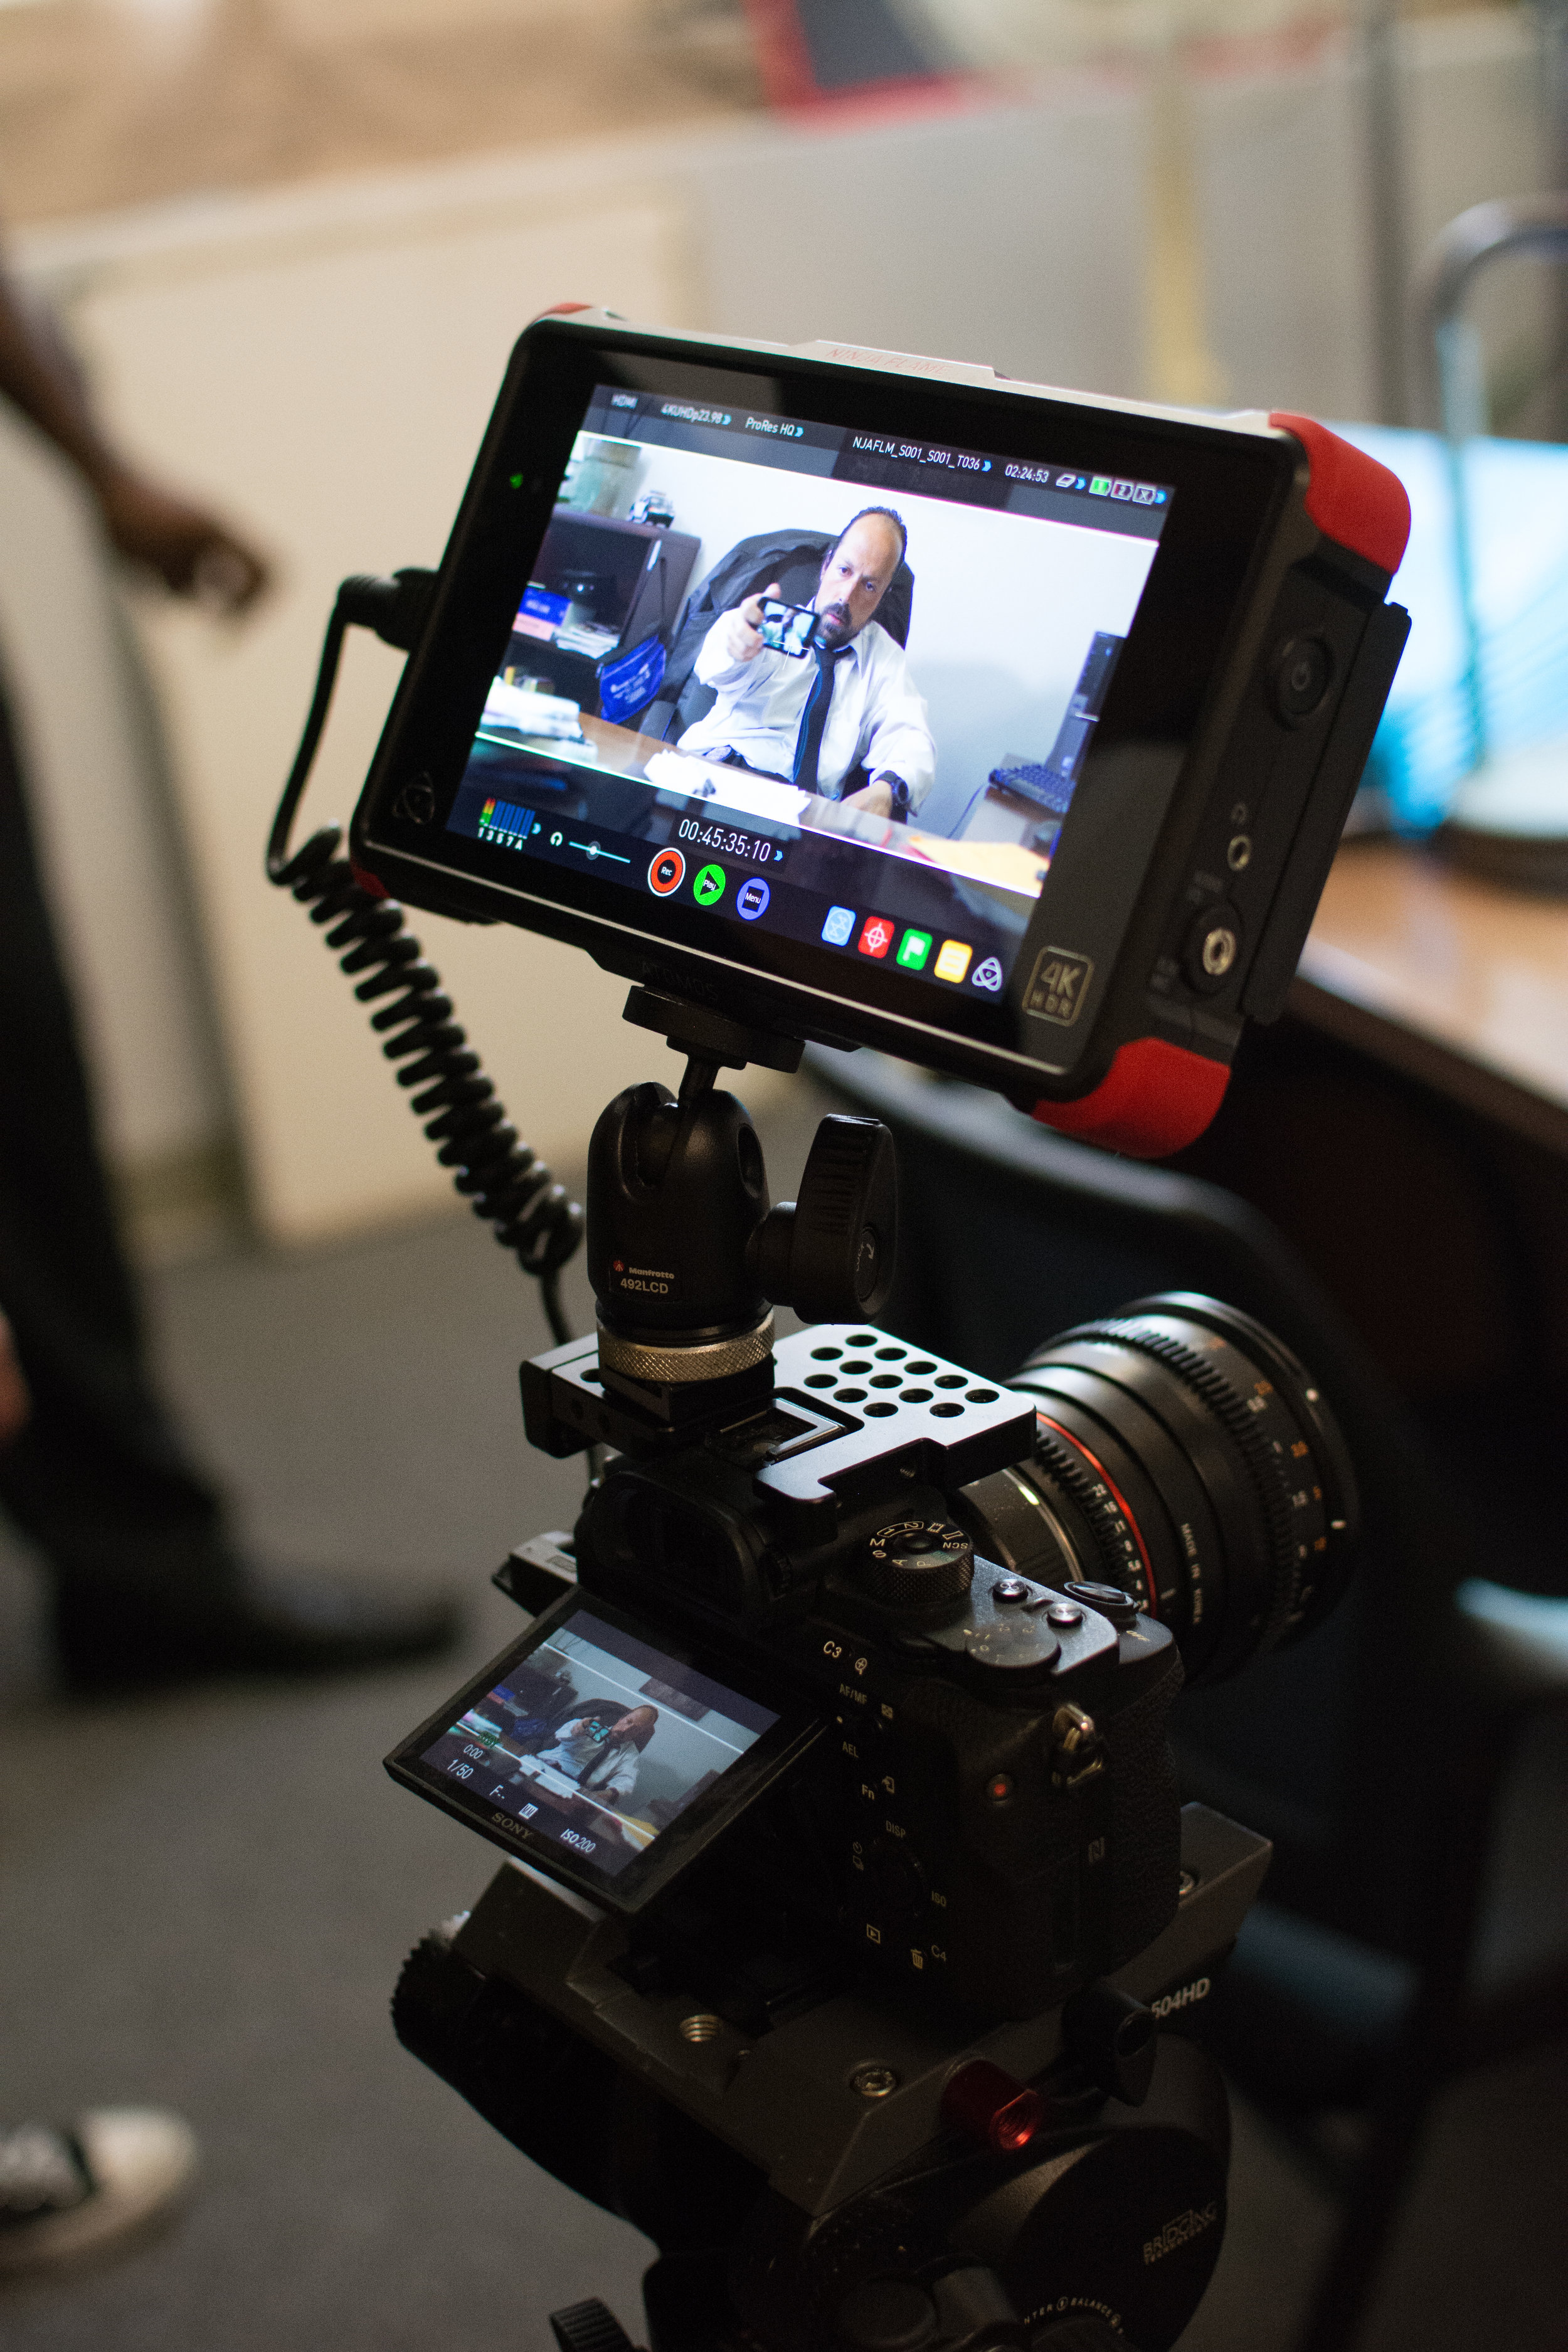 The Setup: Sony A7s ii, Rokinon Cine DS Lenses, Ninja Flame Recorder